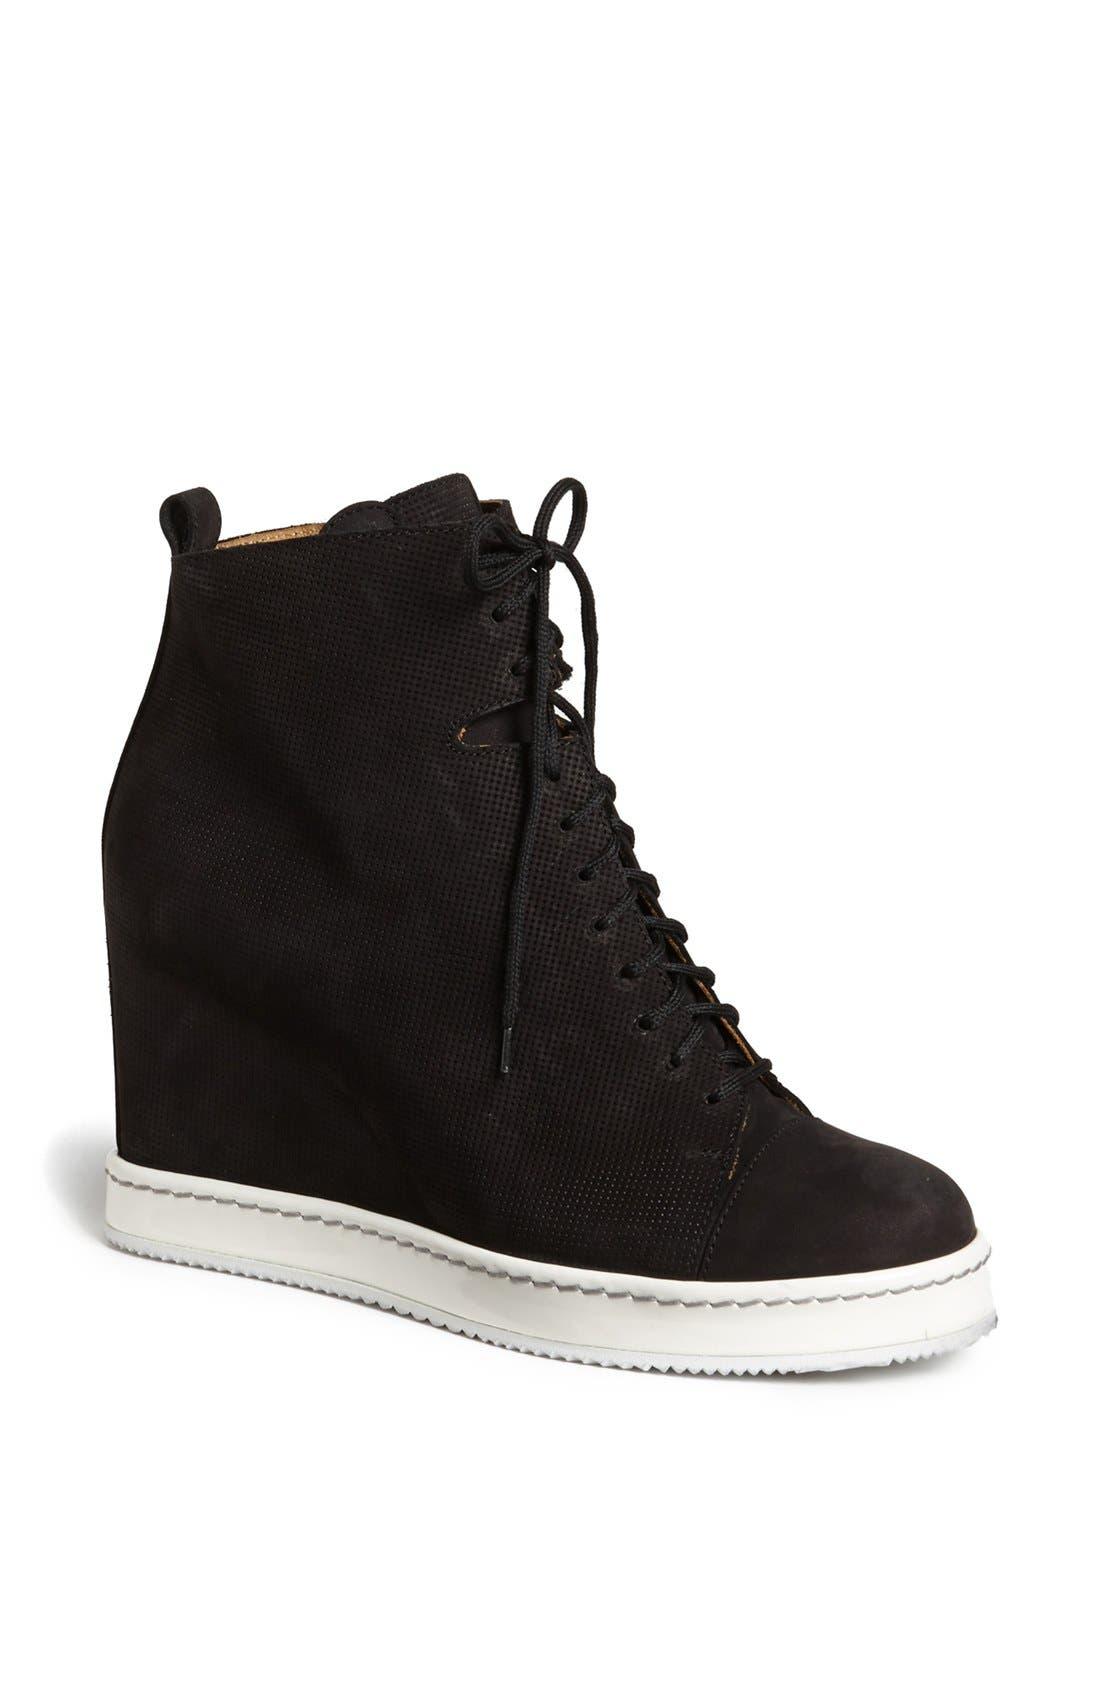 Alternate Image 1 Selected - MM6 Maison Margiela Wedge Sneaker (Online Only)